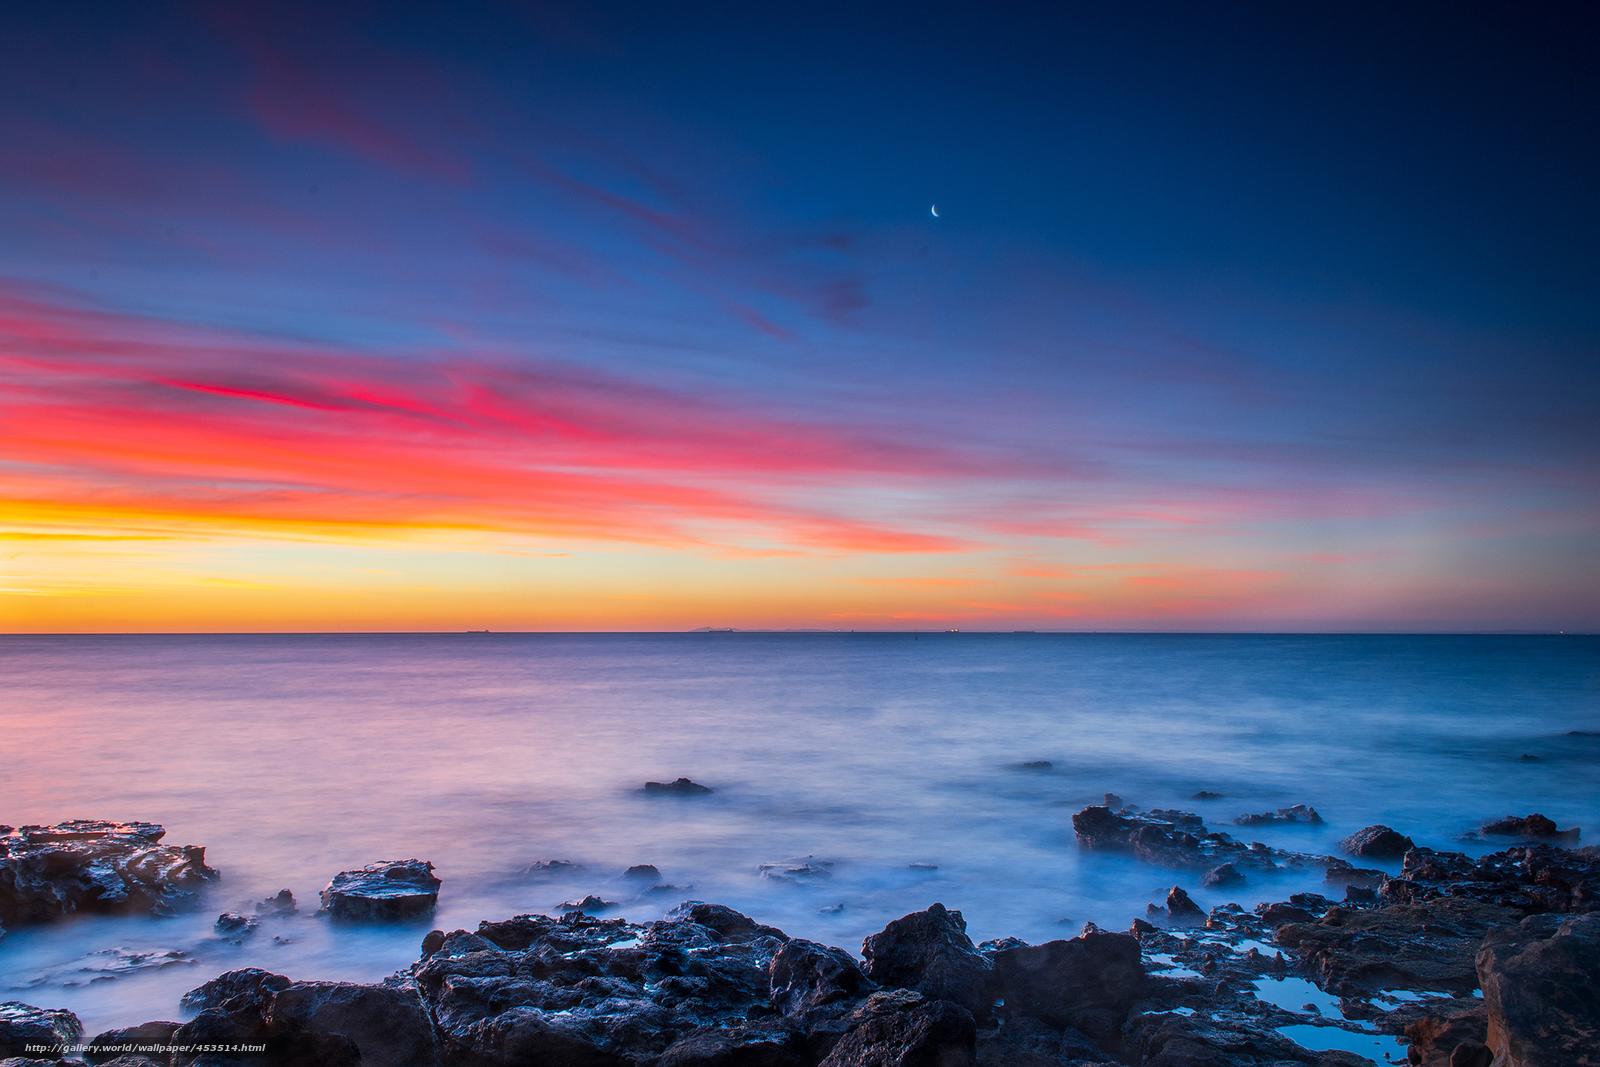 Scaricare gli sfondi australia melbourne cielo tramonto for Desktop gratis mare